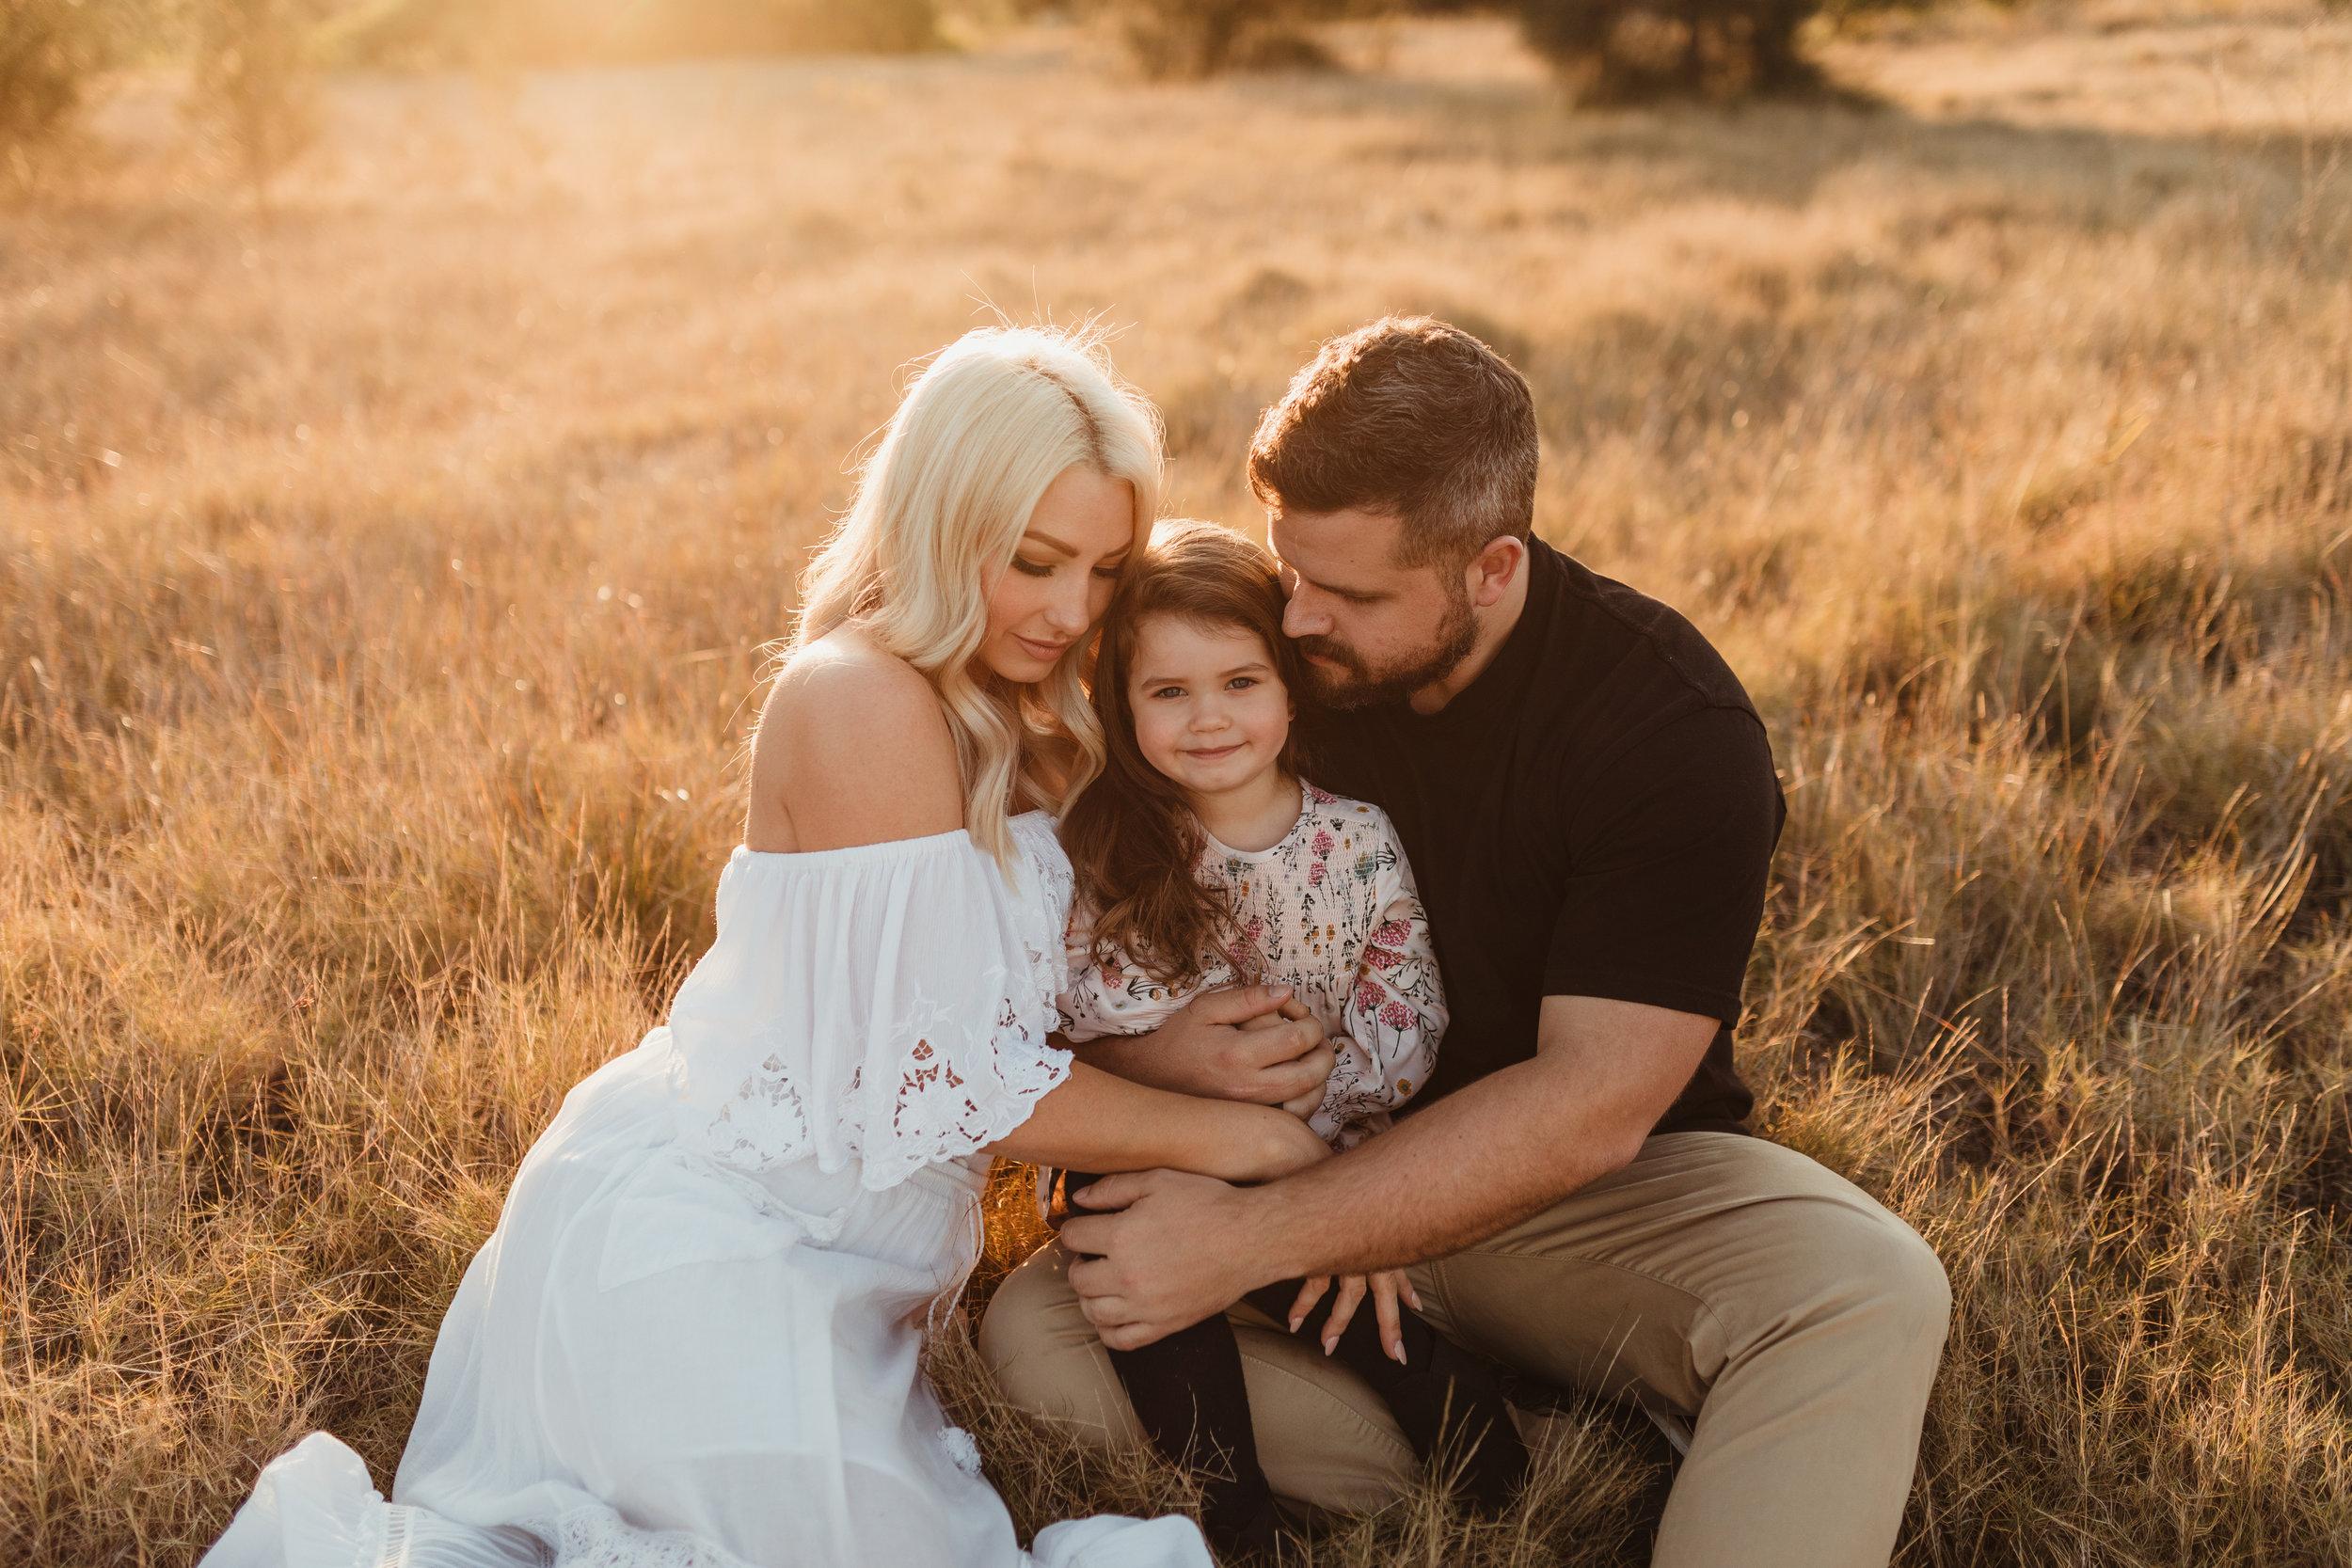 Krystle Brant | Mum Network